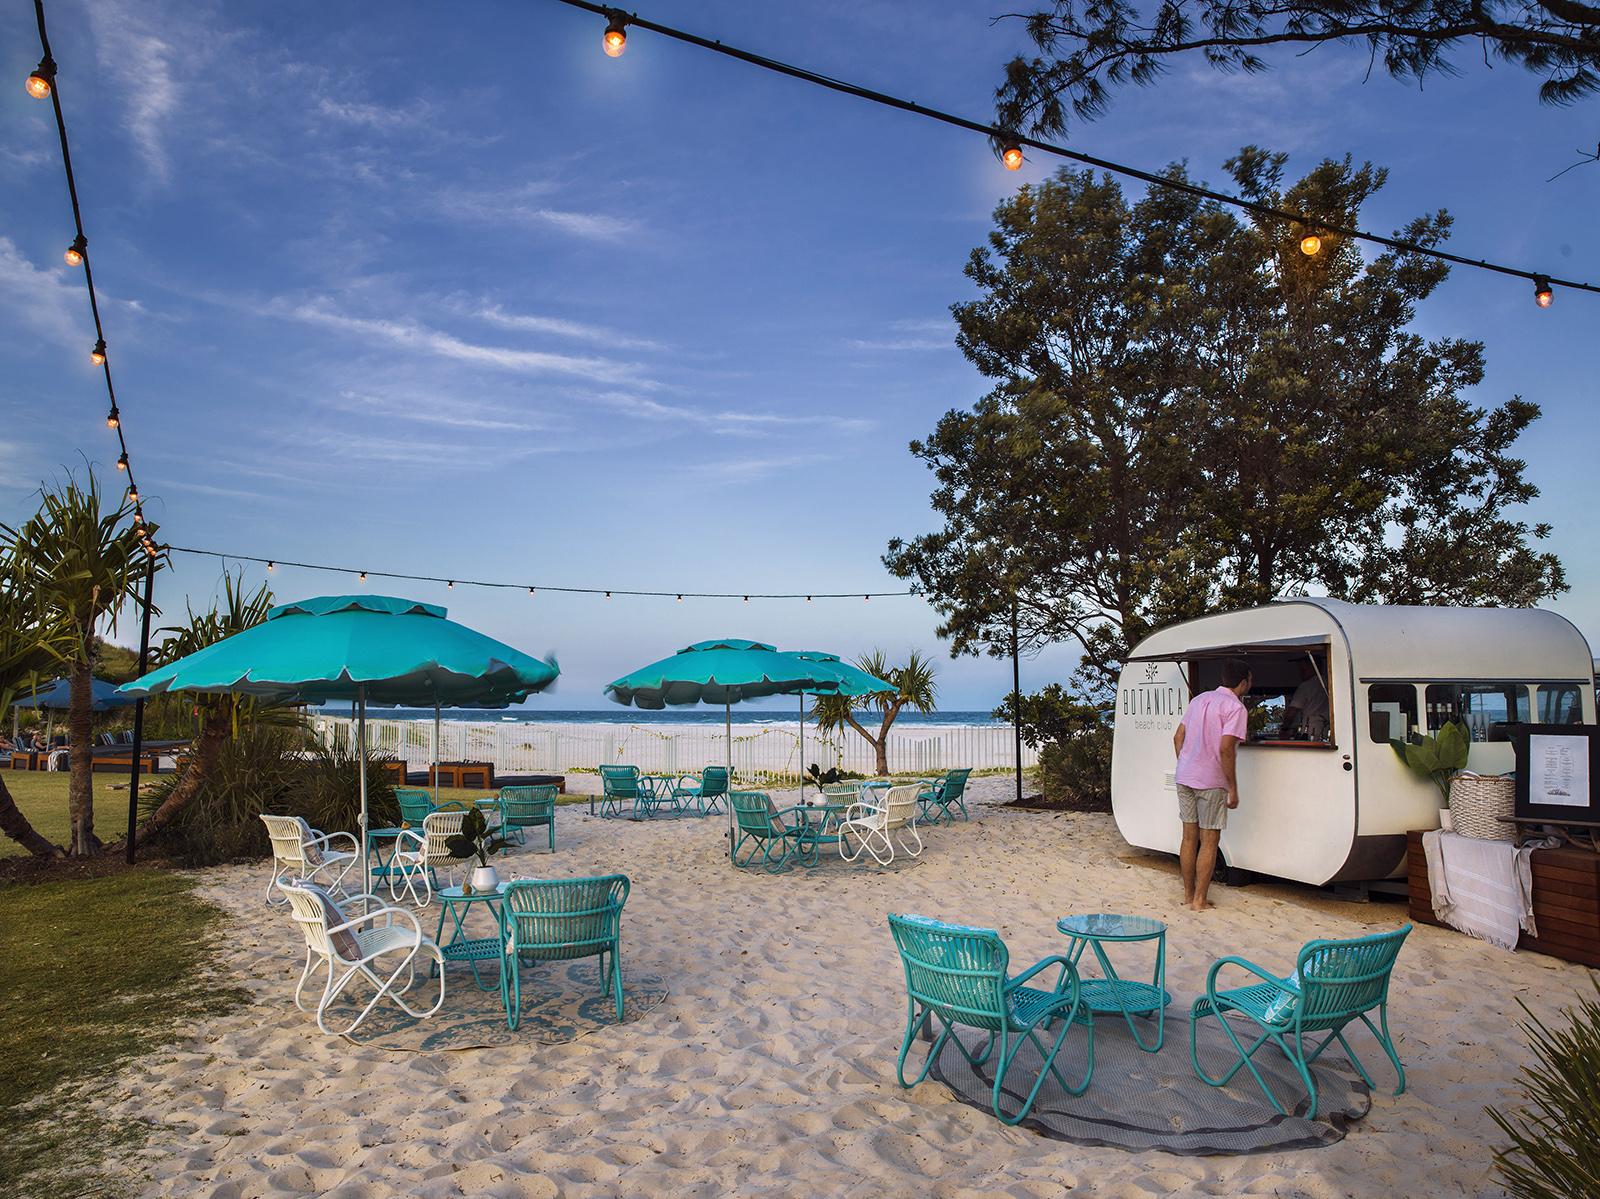 Botanica Beach Club / This photo by Jason Loucas